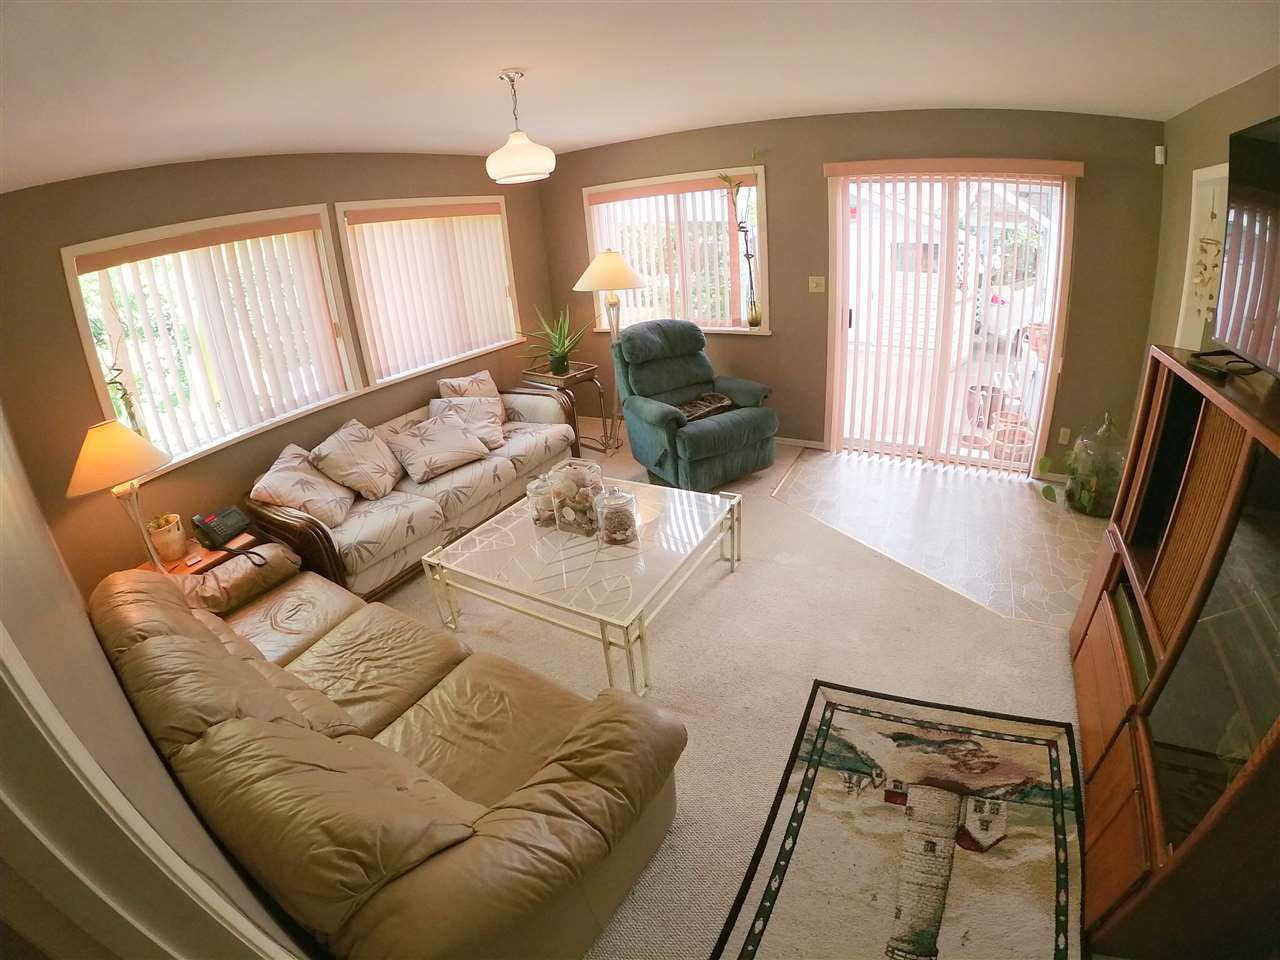 Photo 17: Photos: 5702 MEDUSA Street in Sechelt: Sechelt District House for sale (Sunshine Coast)  : MLS®# R2323721